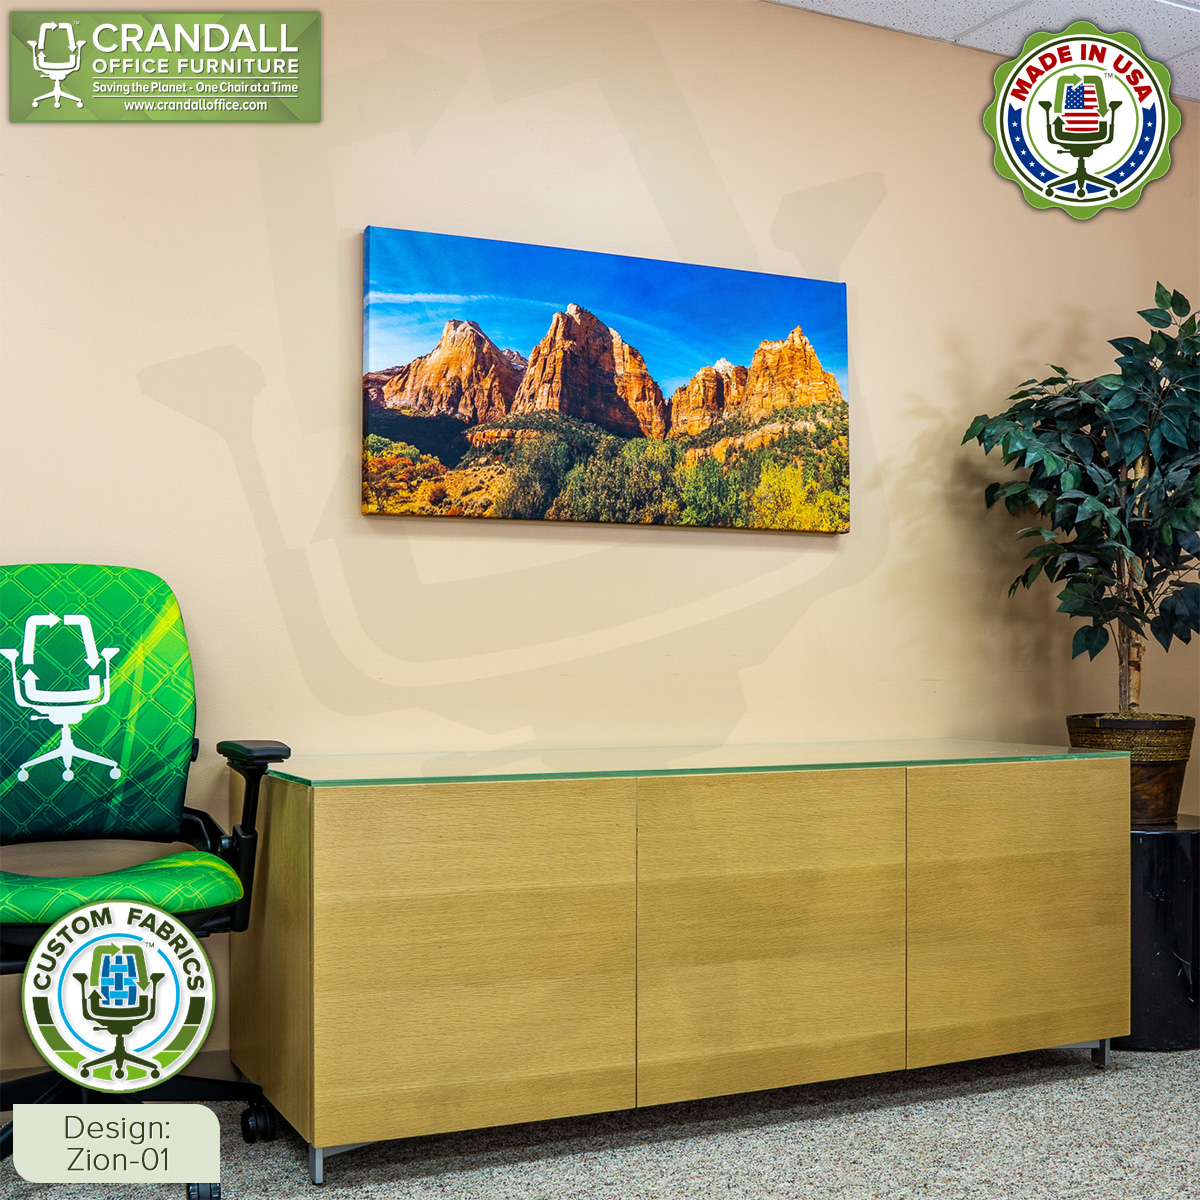 Crandall Office Custom Fabric Art Acoustic Sound Panels - Zion 01